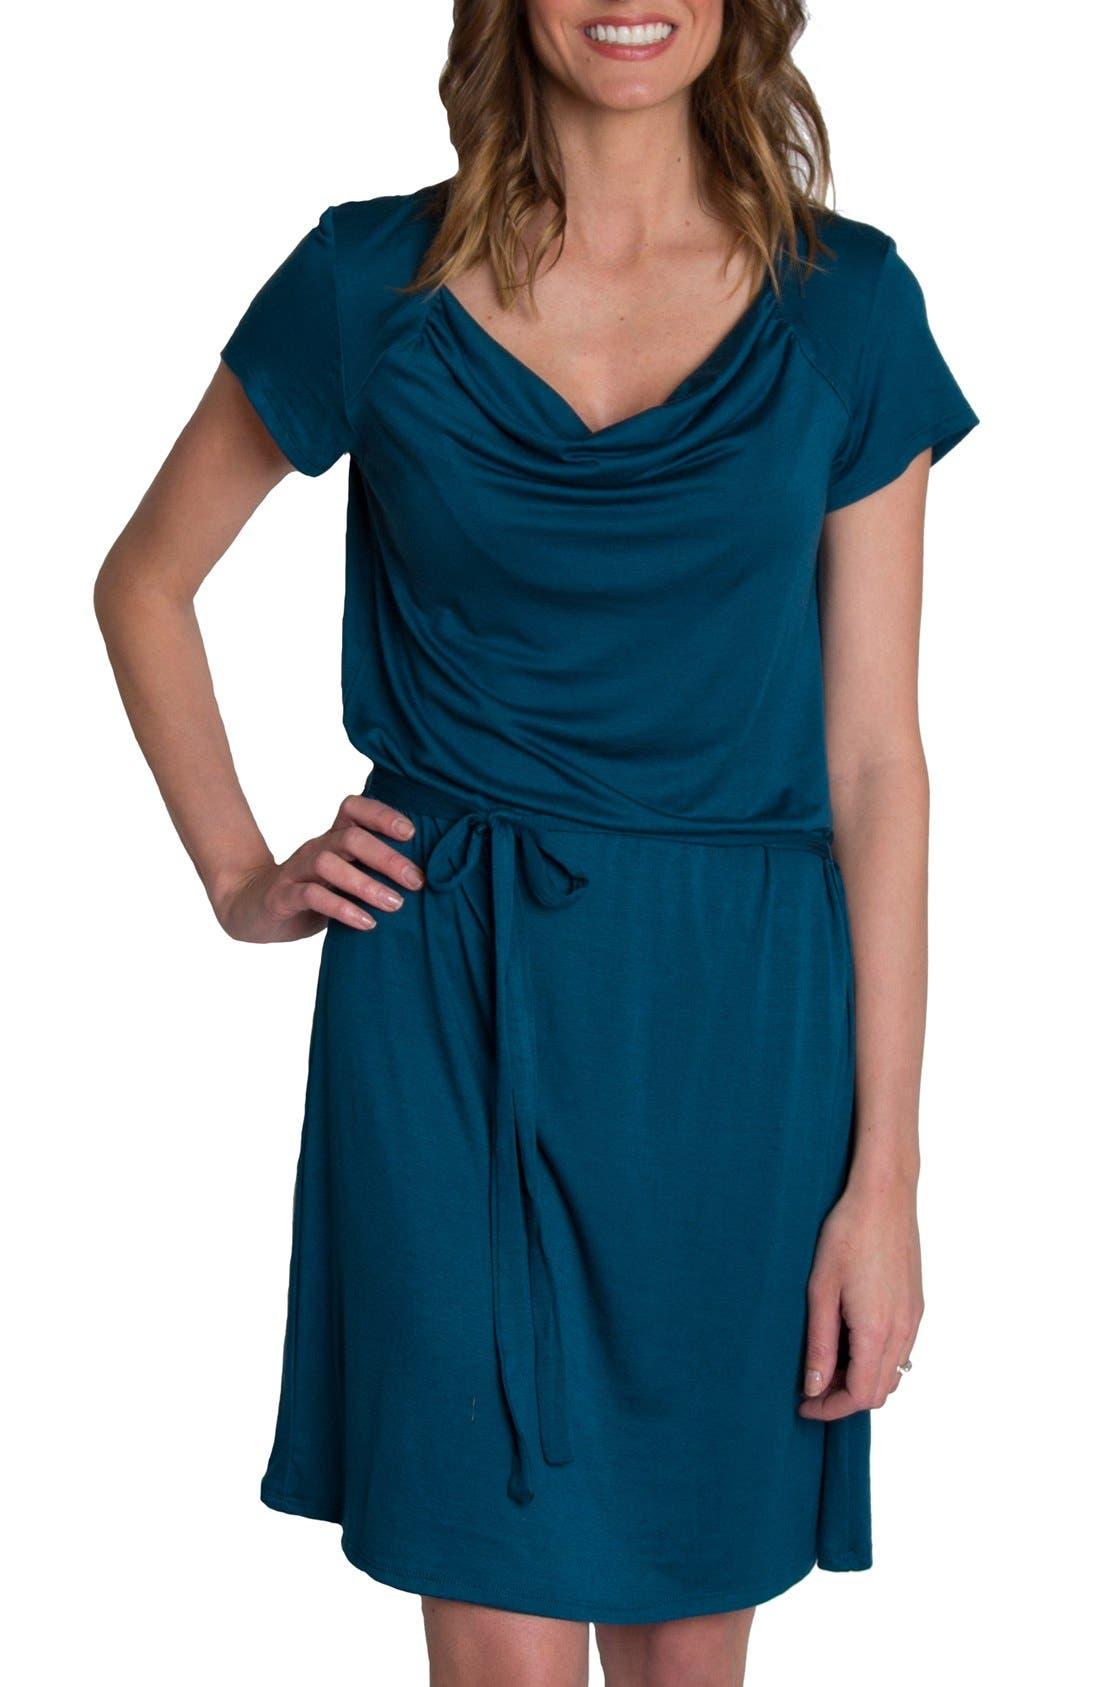 Udderly Hot Mama 'Chic' Cowl Neck Nursing Dress